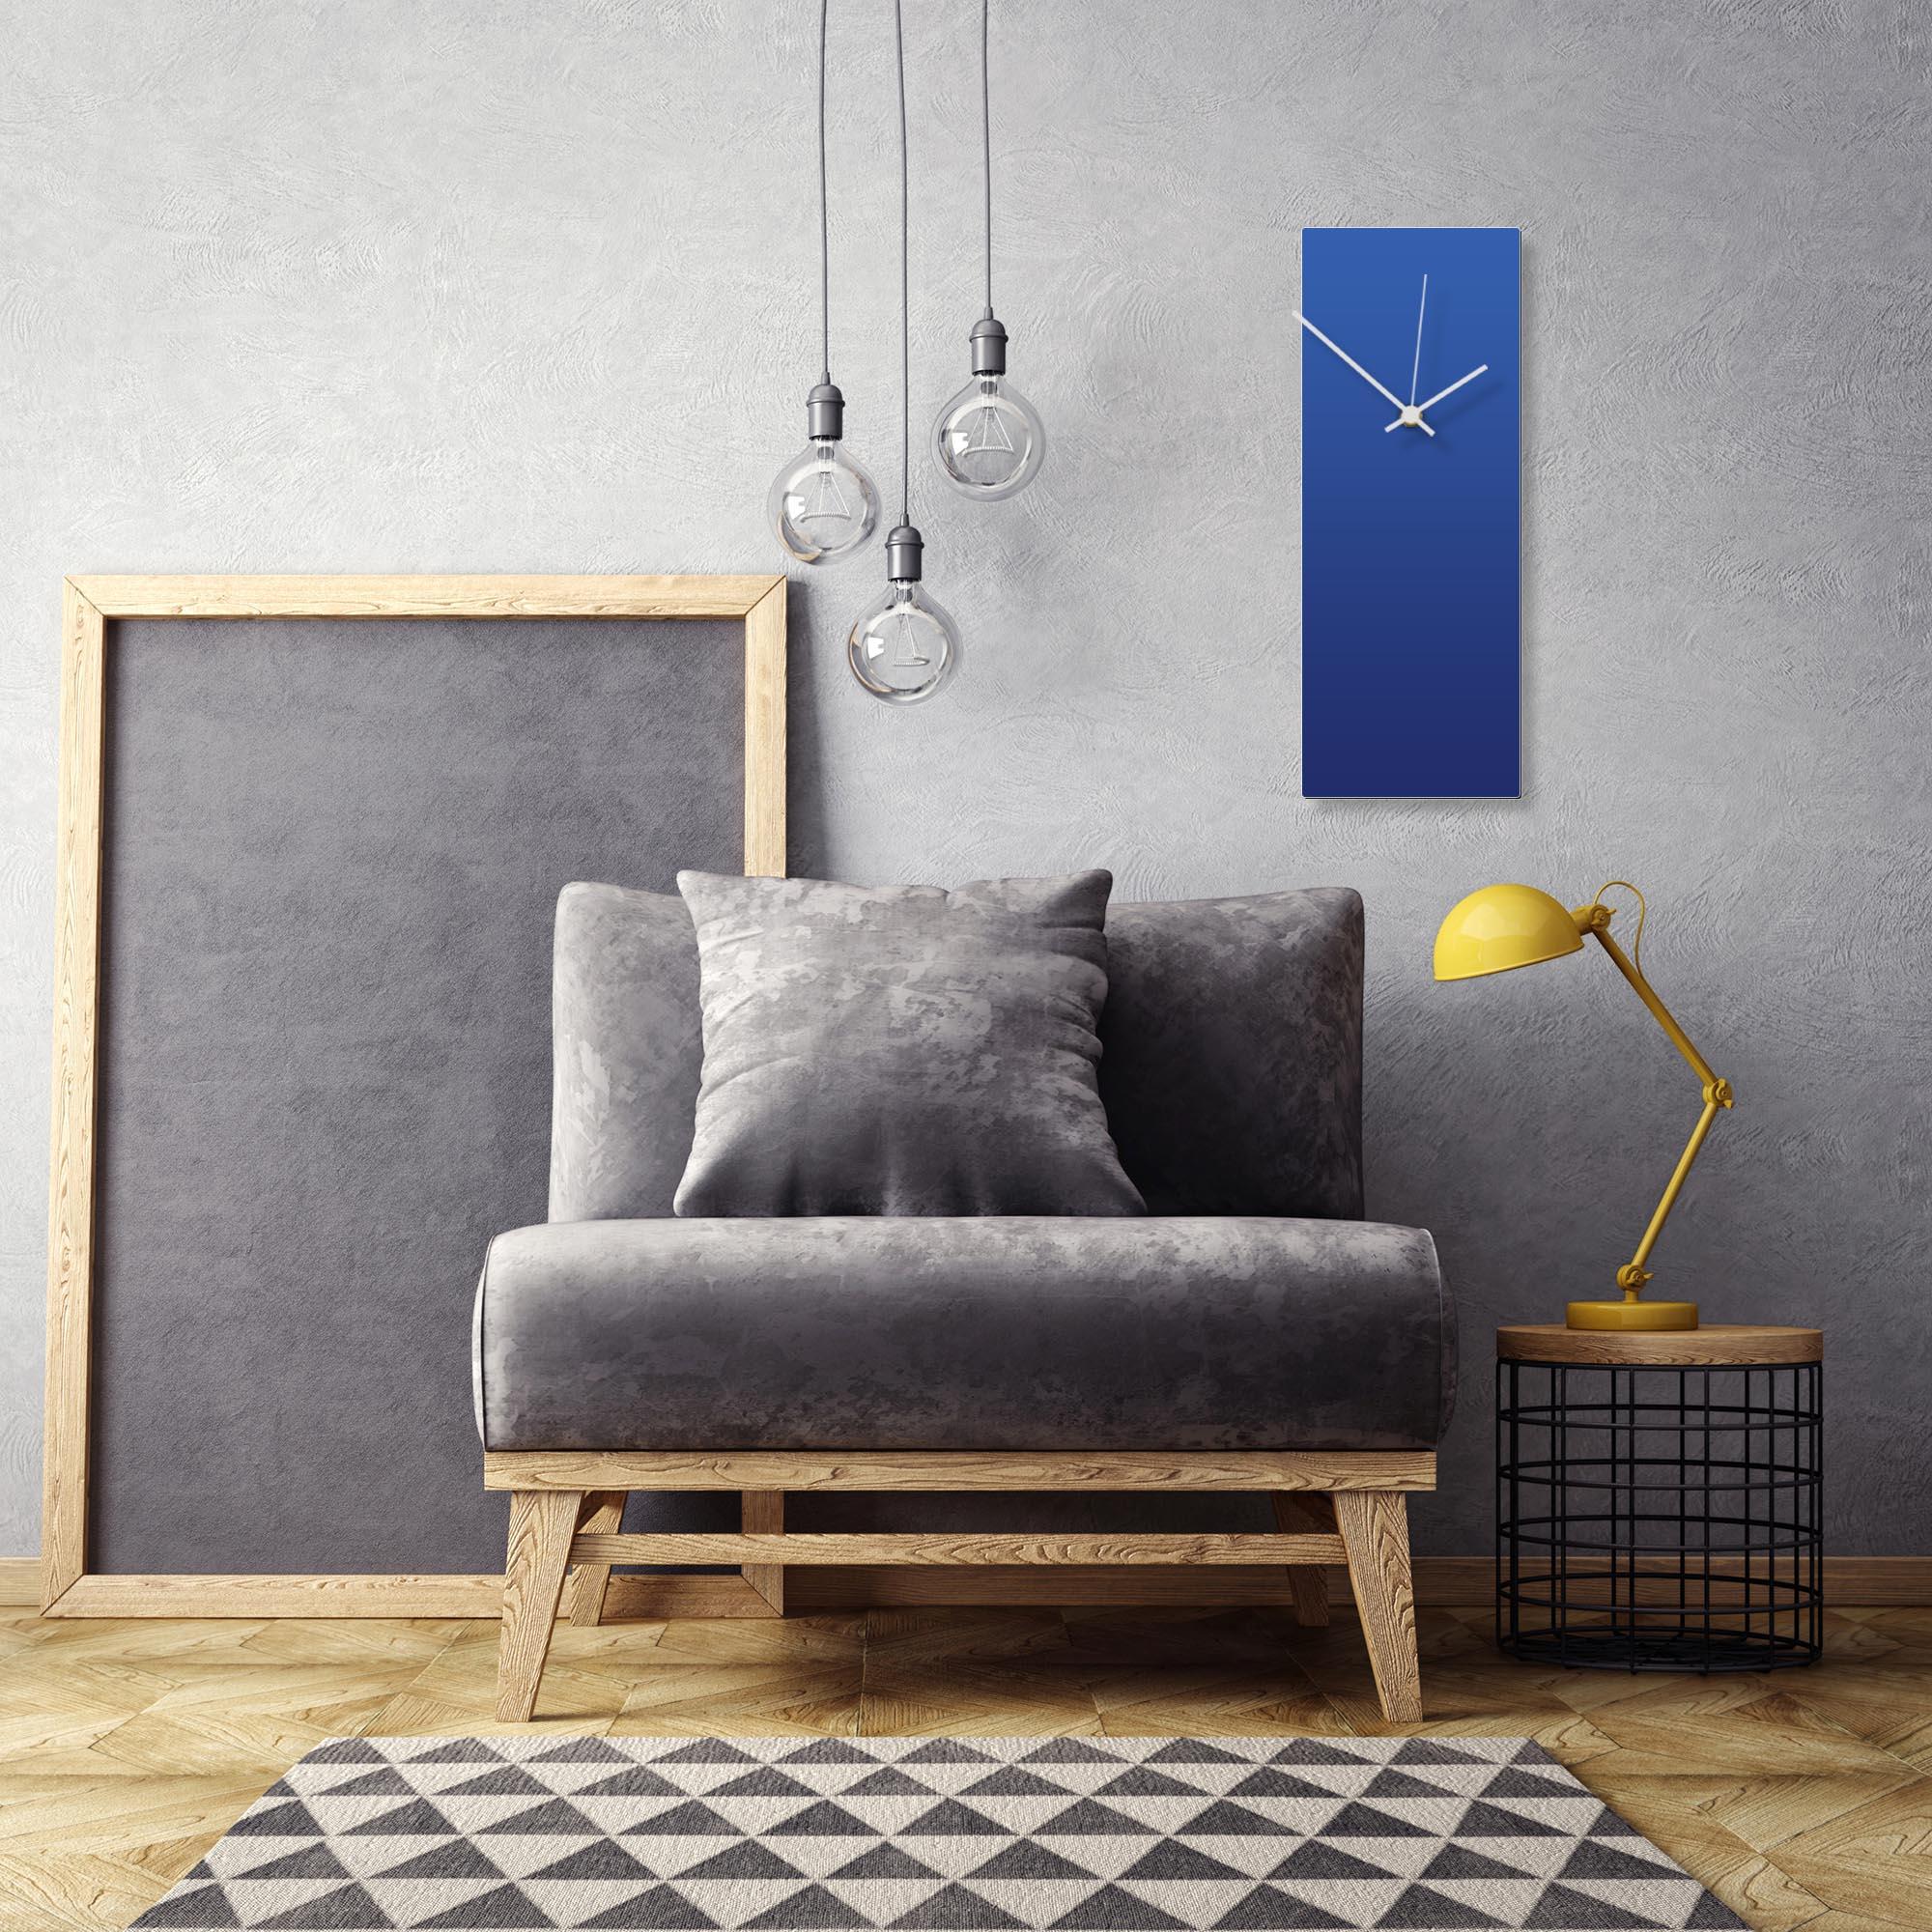 Blueout White Clock Large by Adam Schwoeppe Contemporary Clock on Aluminum Polymetal - Alternate View 1